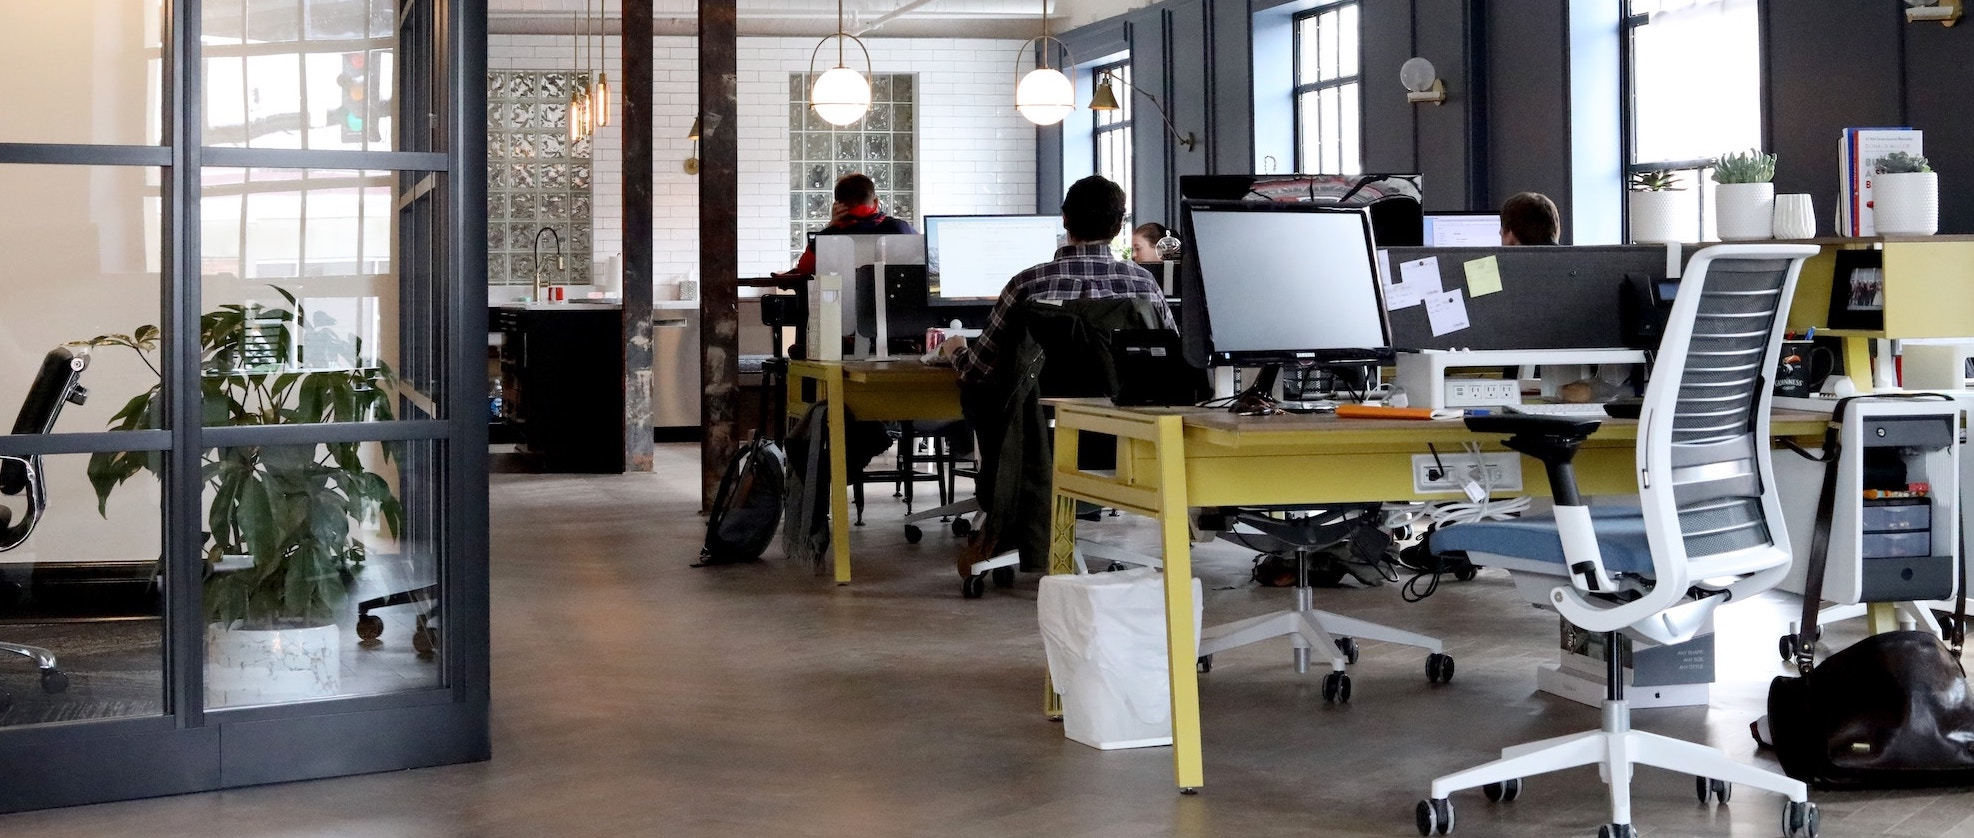 SEO For Small Business Minneapolis, SEO Agency Minneapolis, Acme